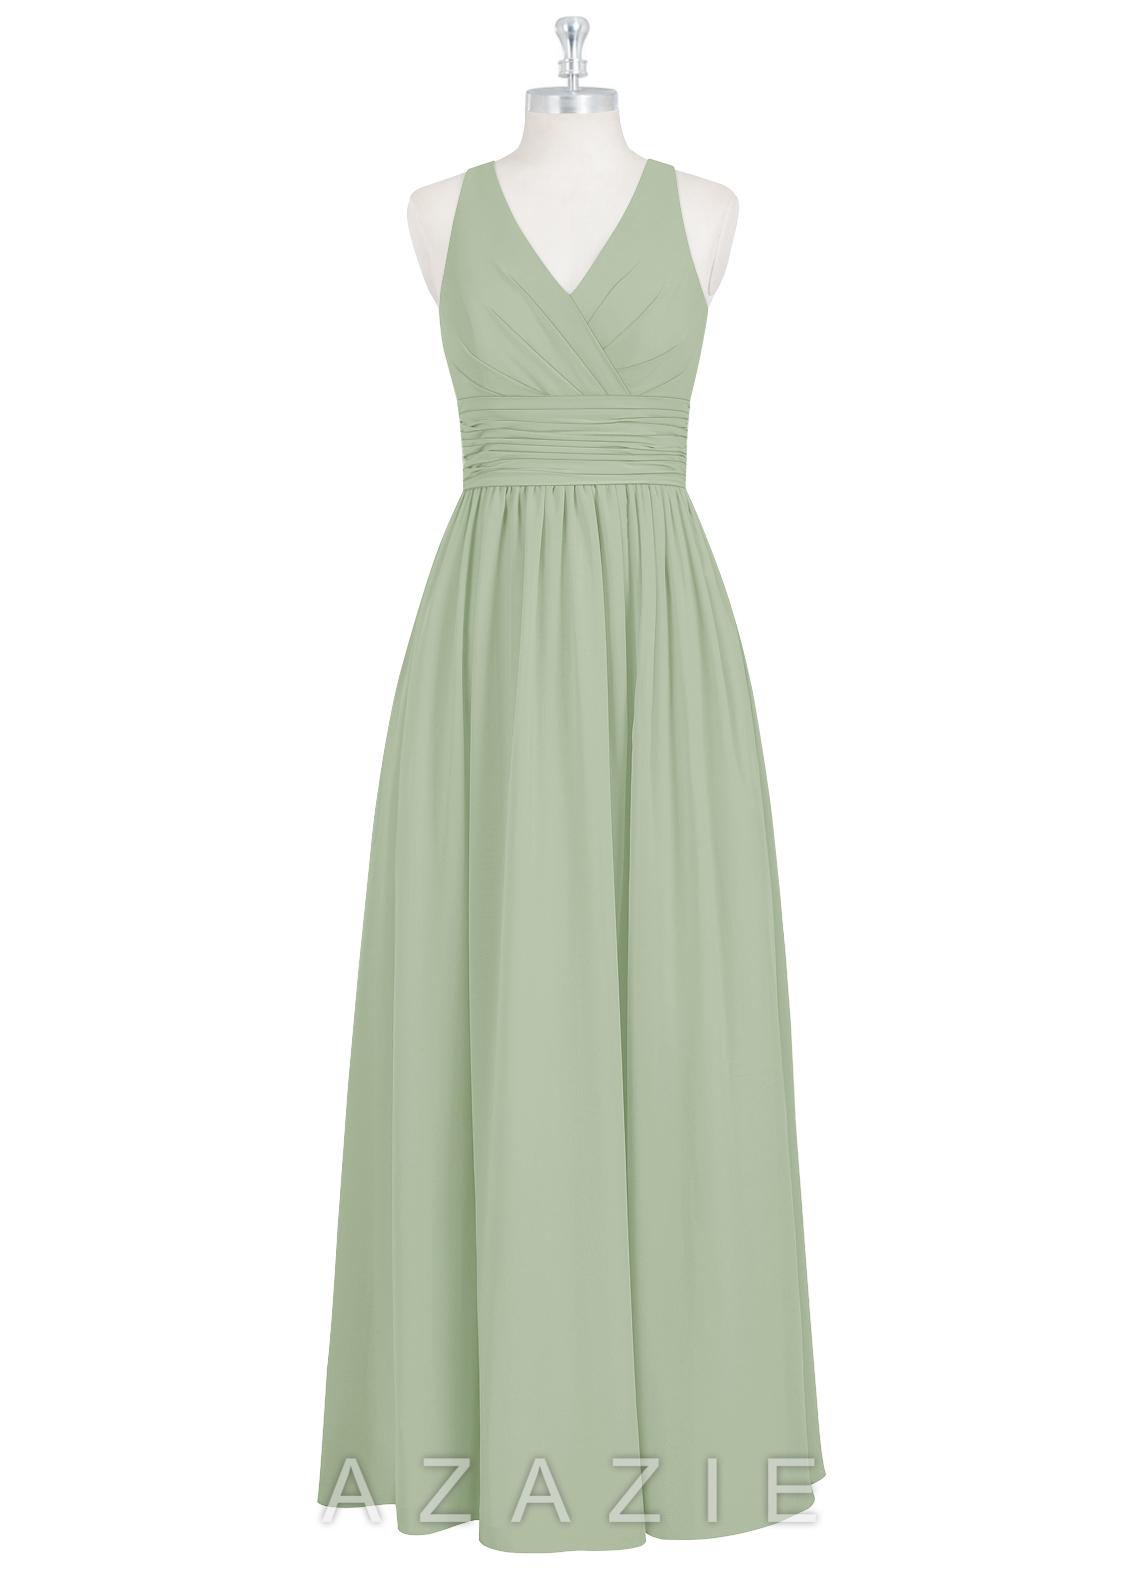 Azazie Natasha Bridesmaid Dress - Dusty Sage  022e1c61f